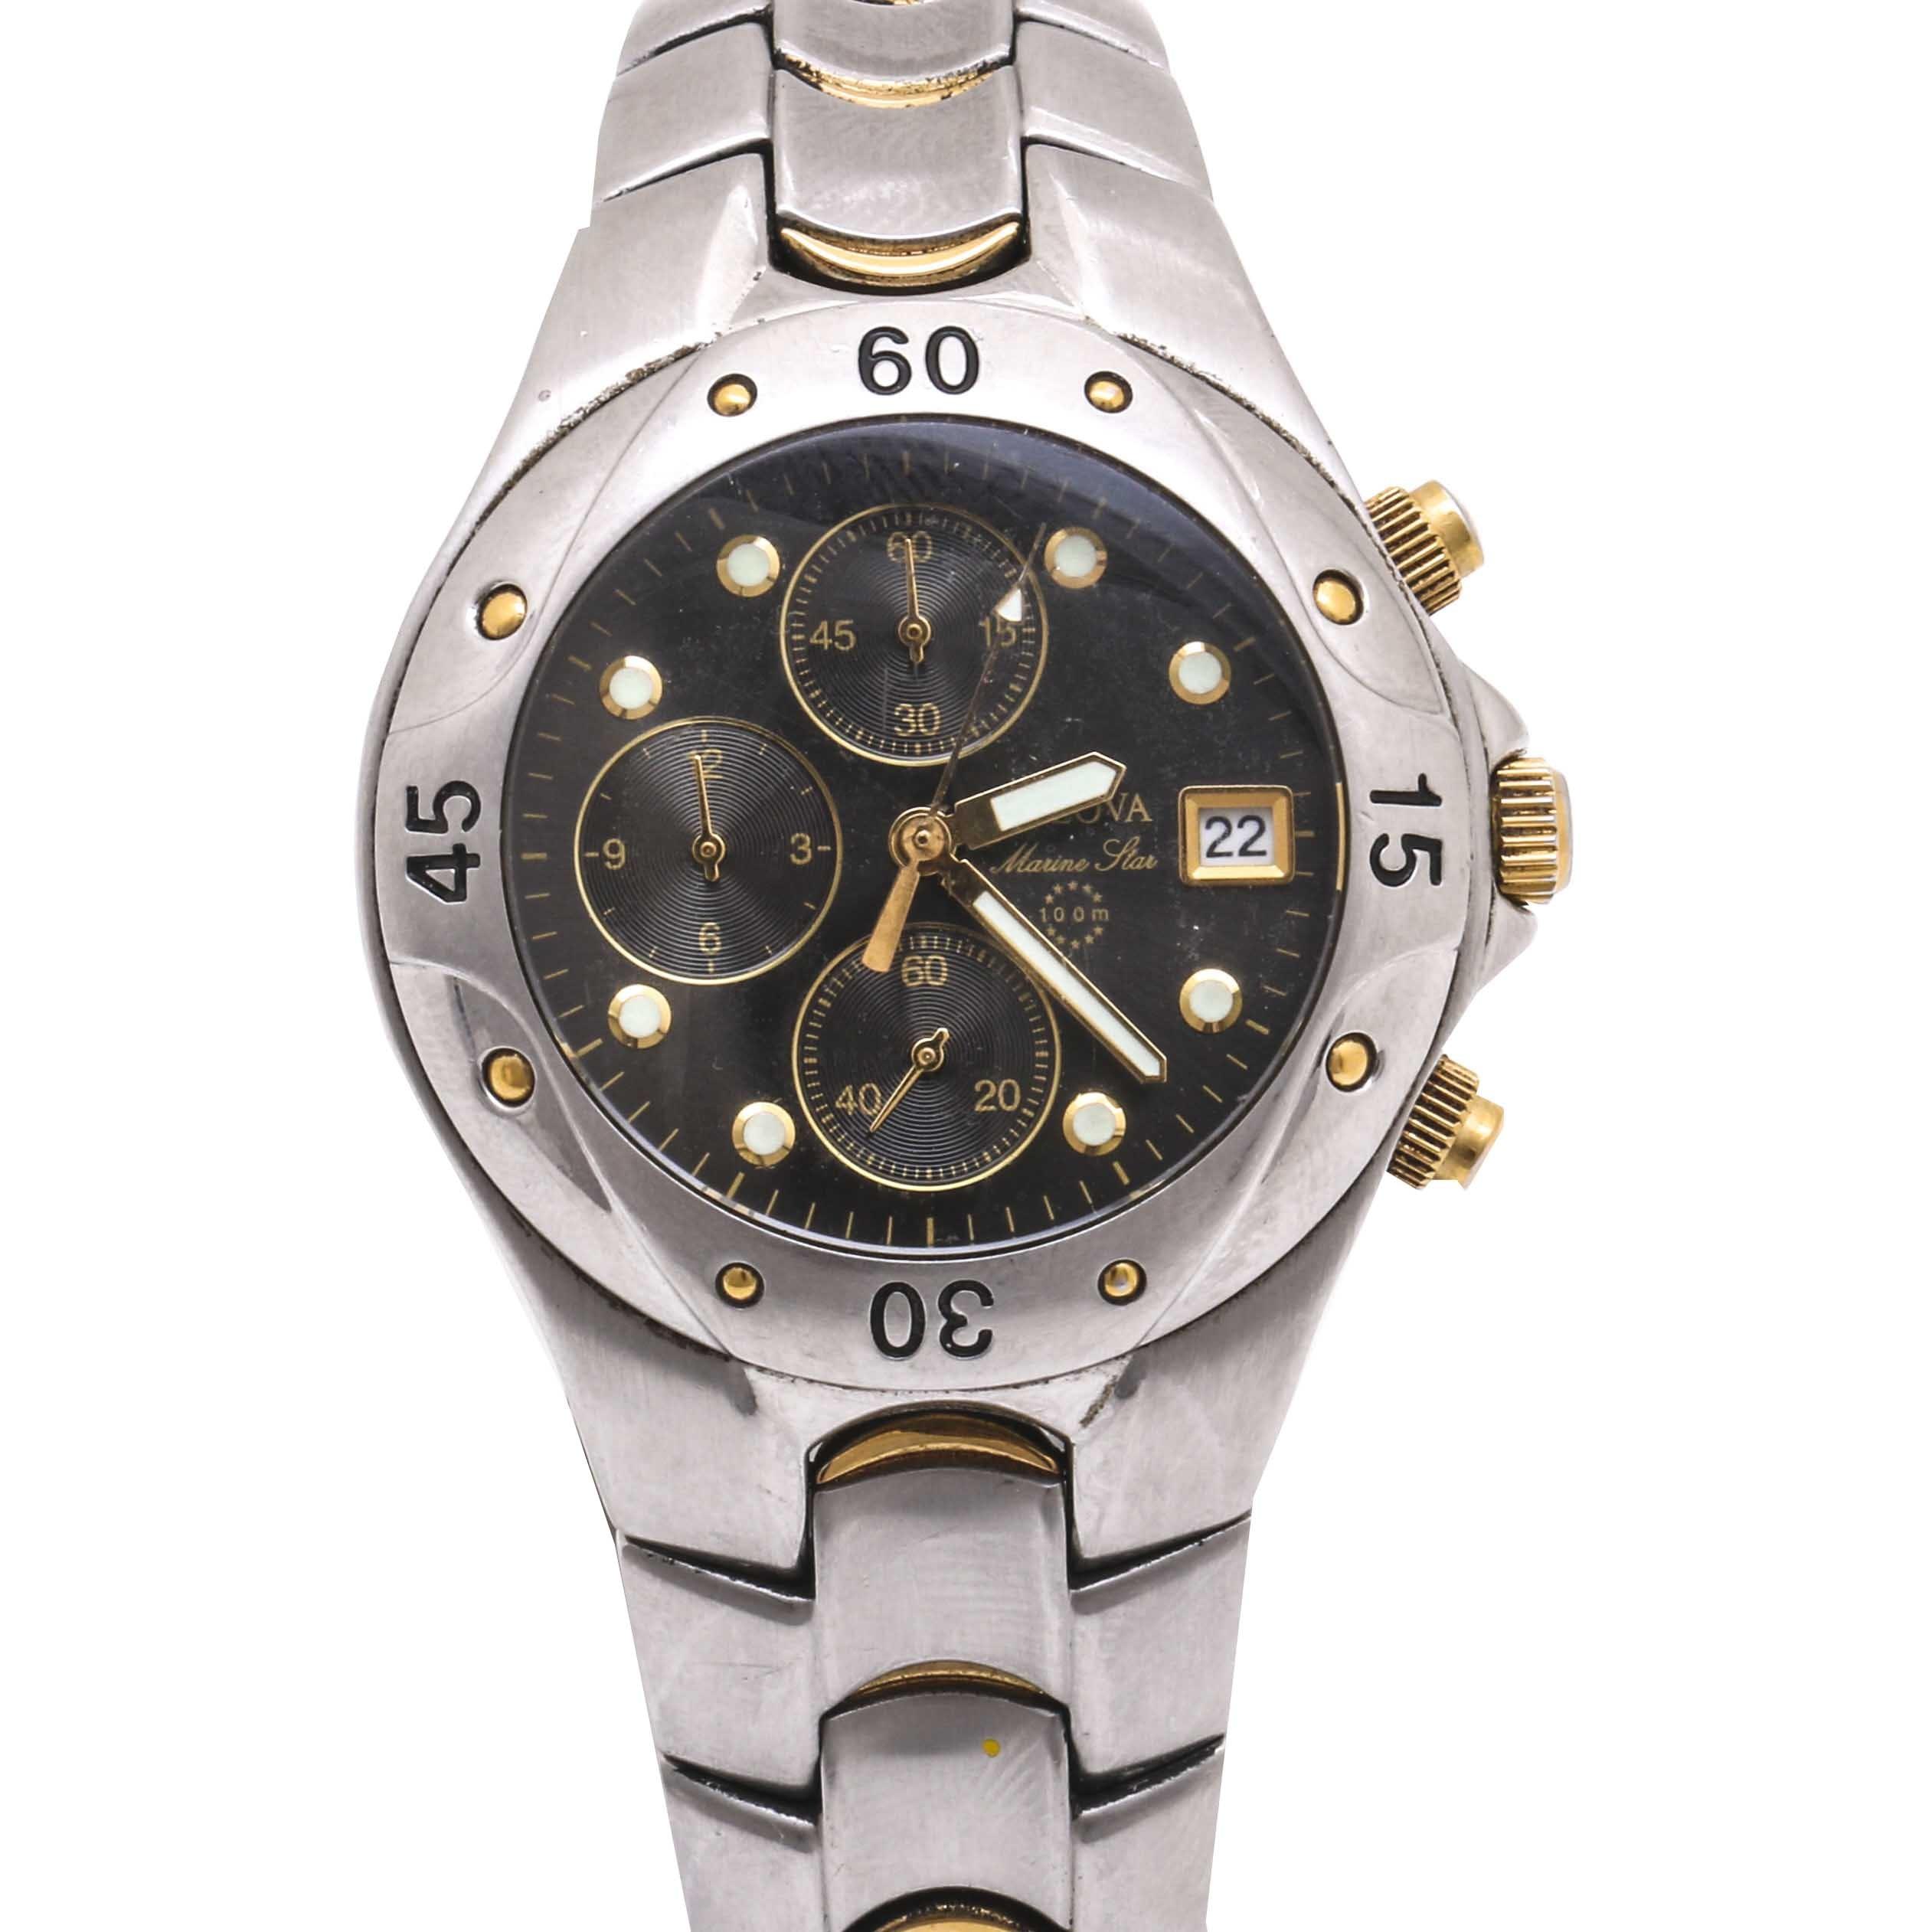 Bulova Two Tone Stainless Steel Marine Star Chronograph Wristwatch